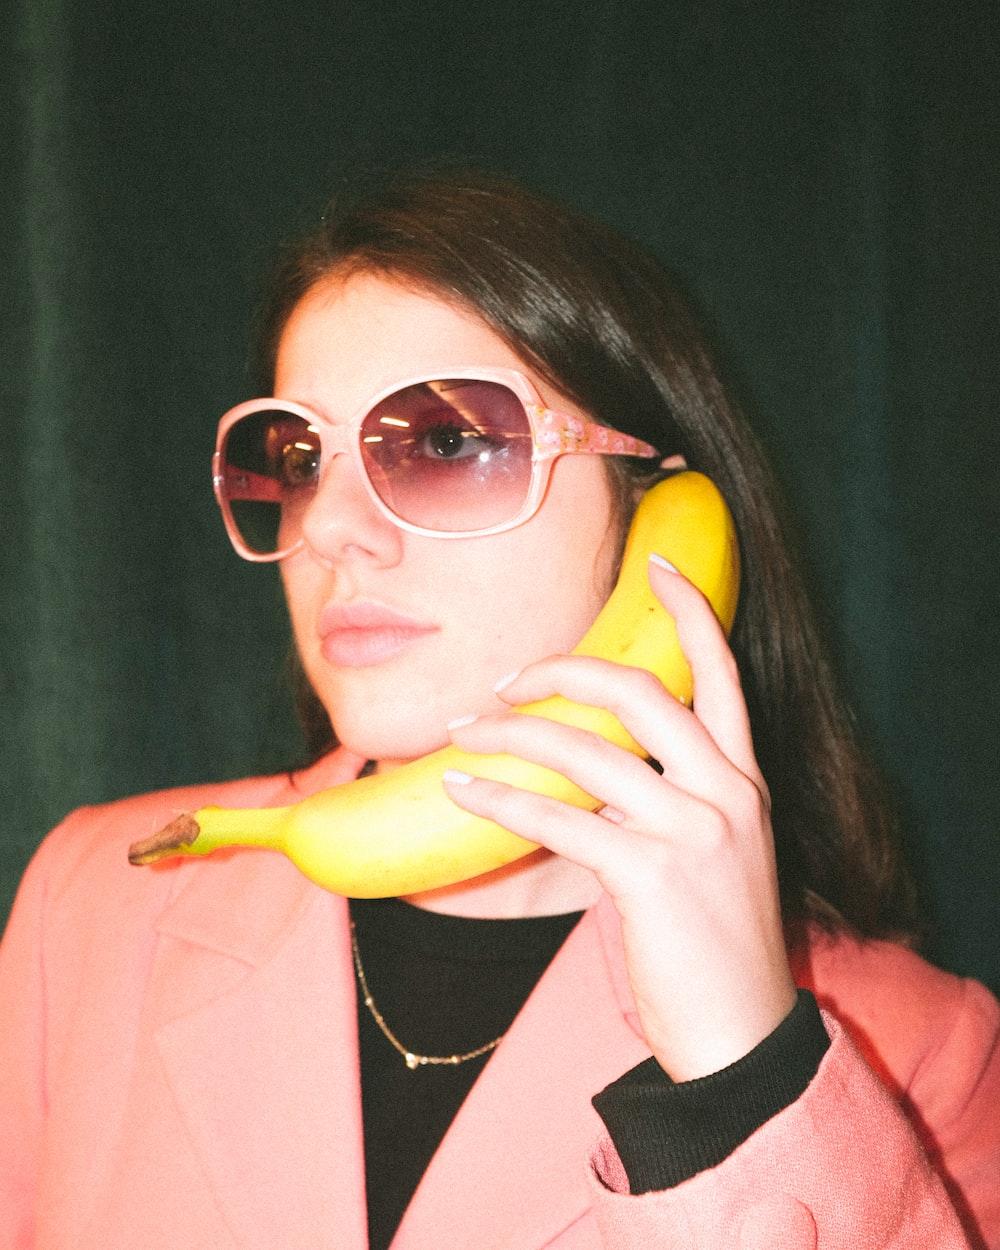 woman in pink blazer holding yellow banana